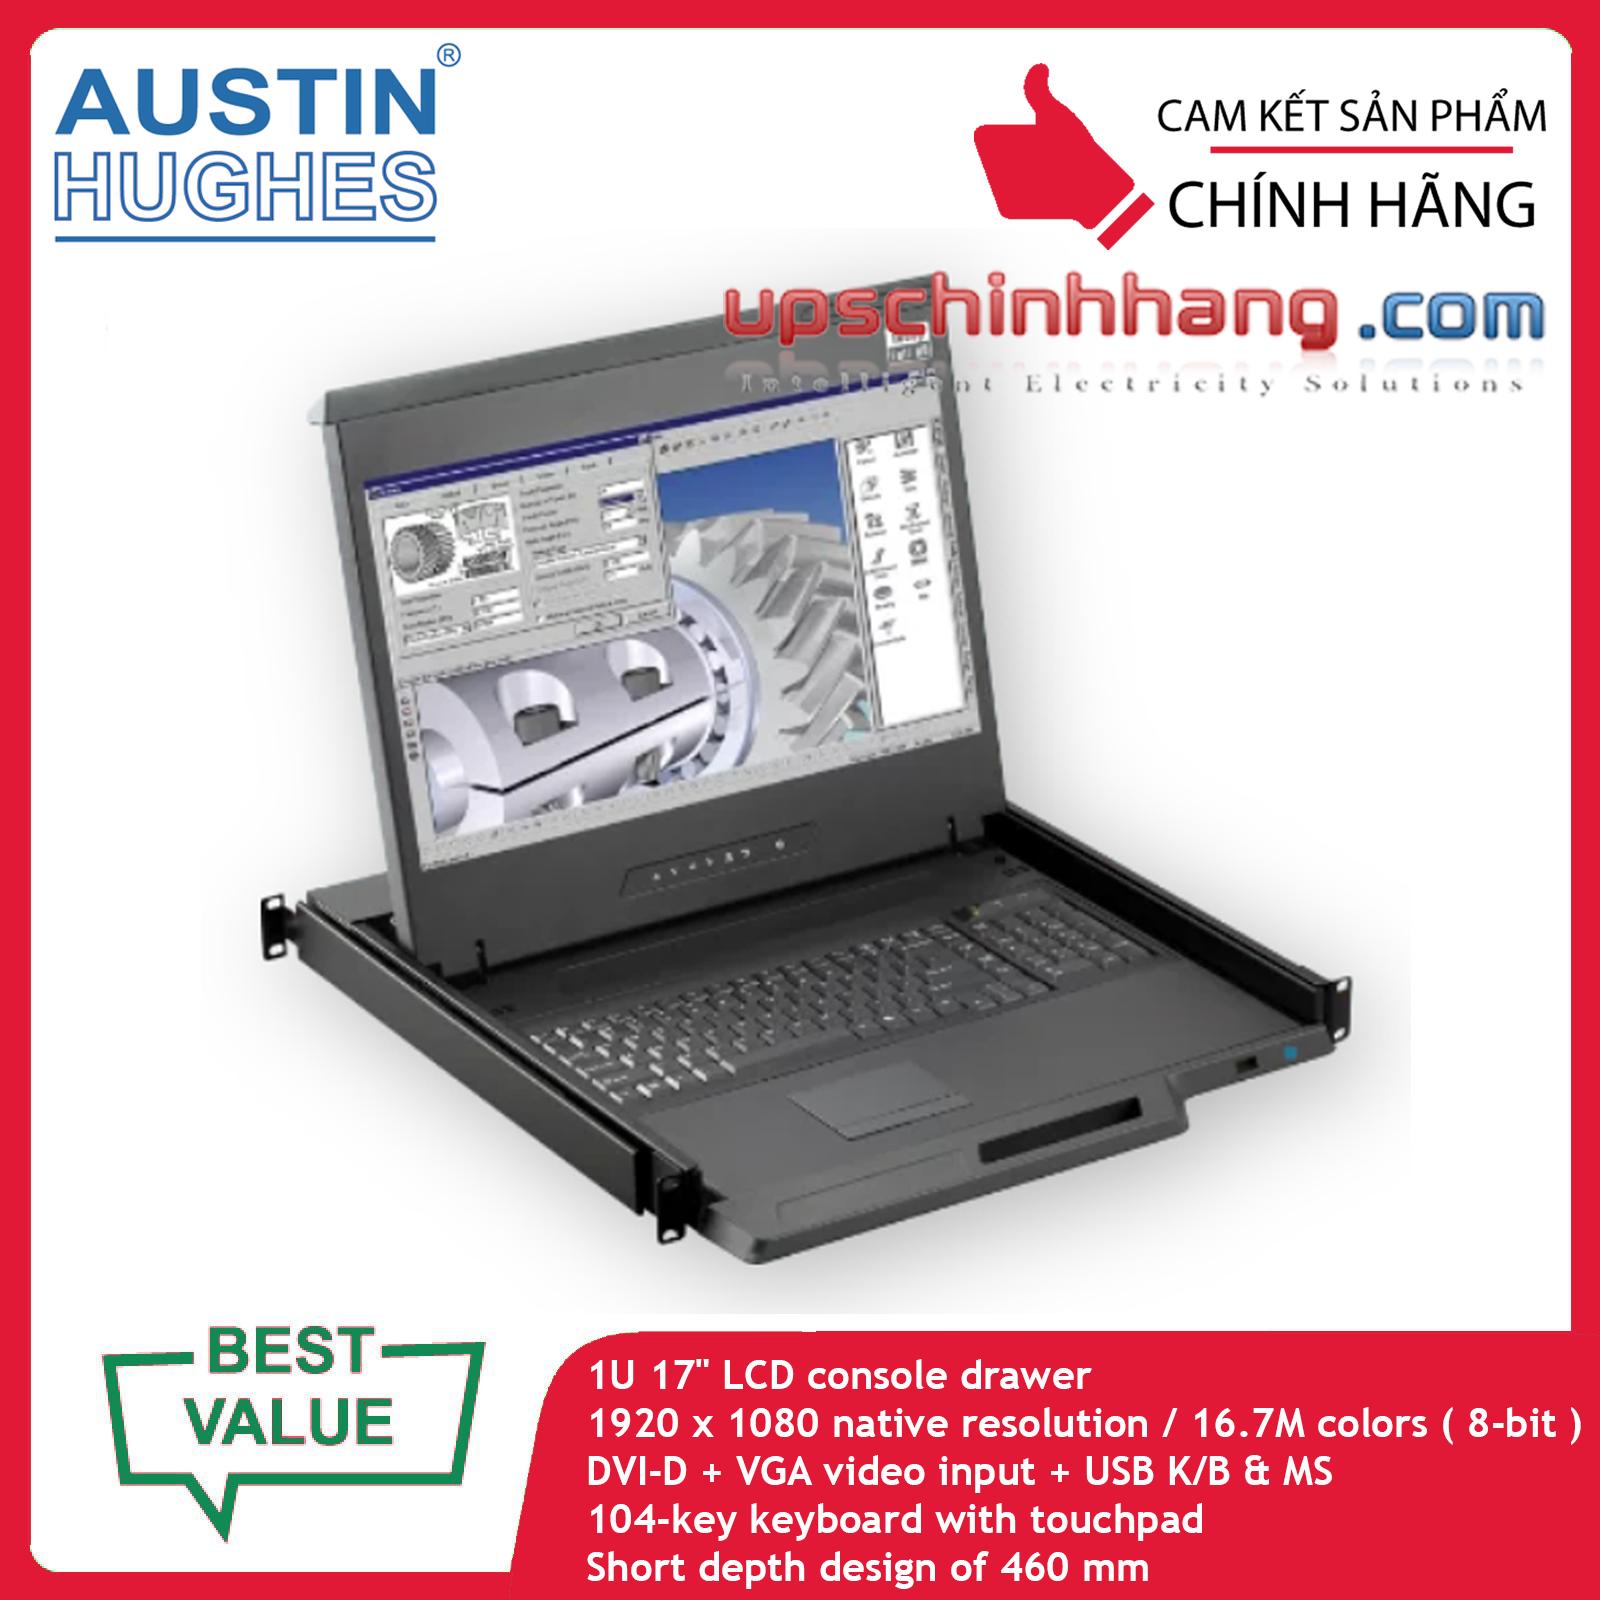 Austin Hughes CyberView F117e | 1U 17inch 1080p LCD Console Drawer